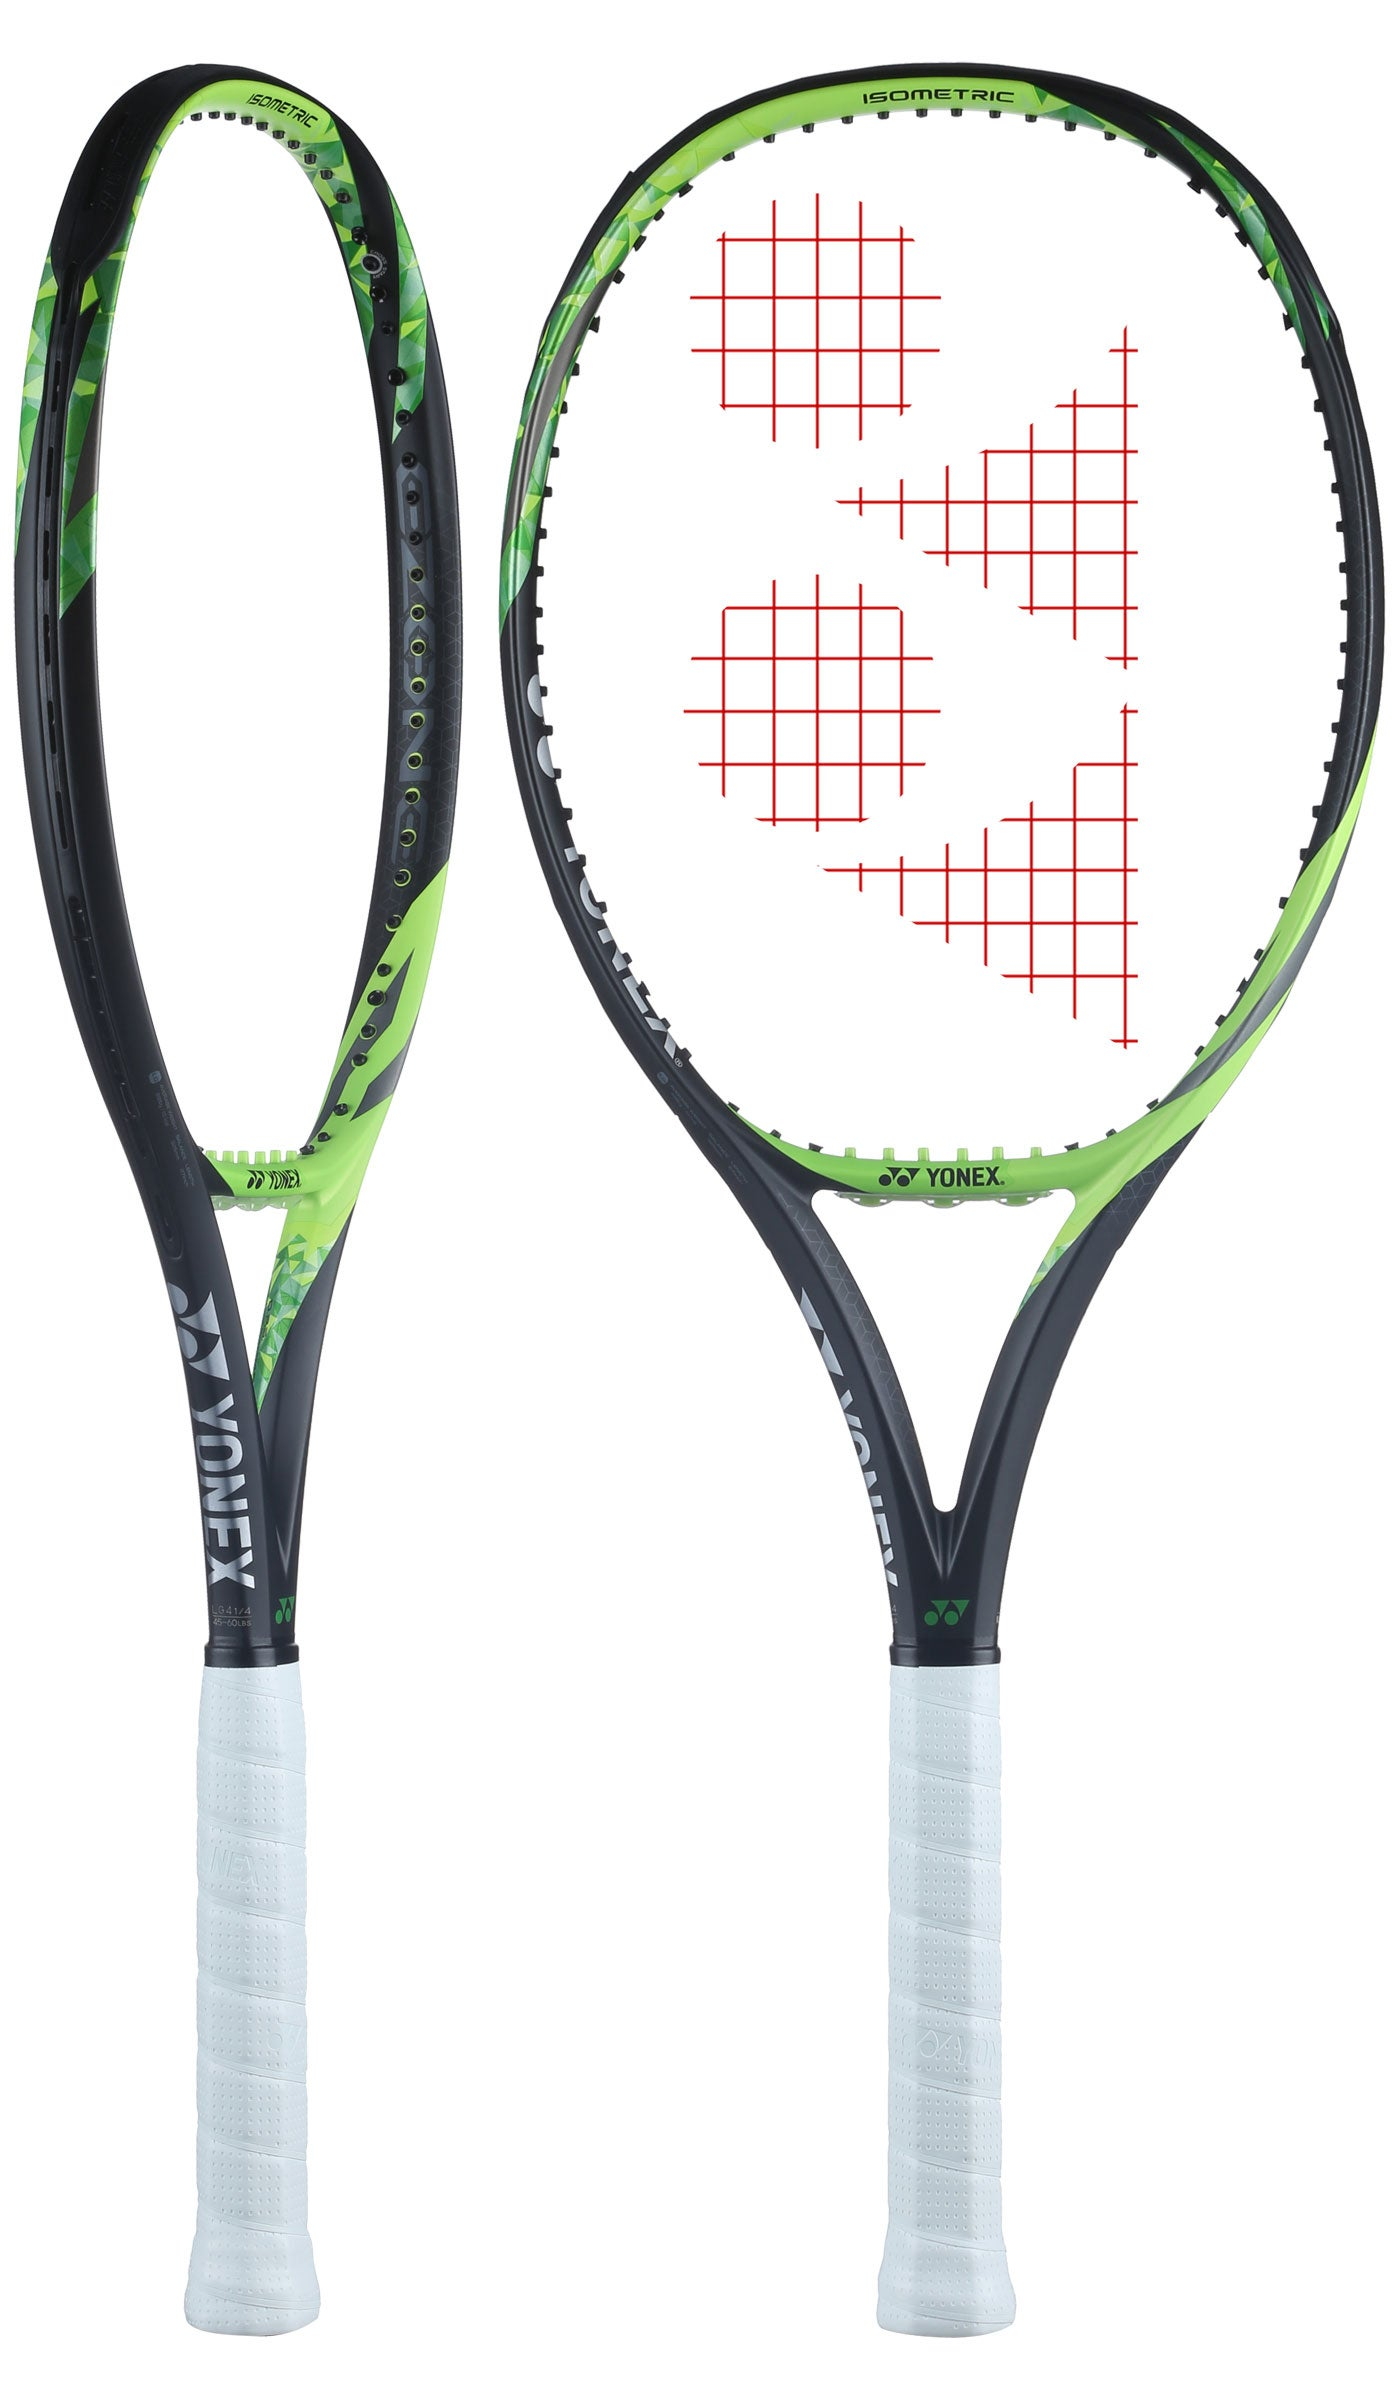 Yonex EZONE 100 (285g) Racquets (Lime Green)